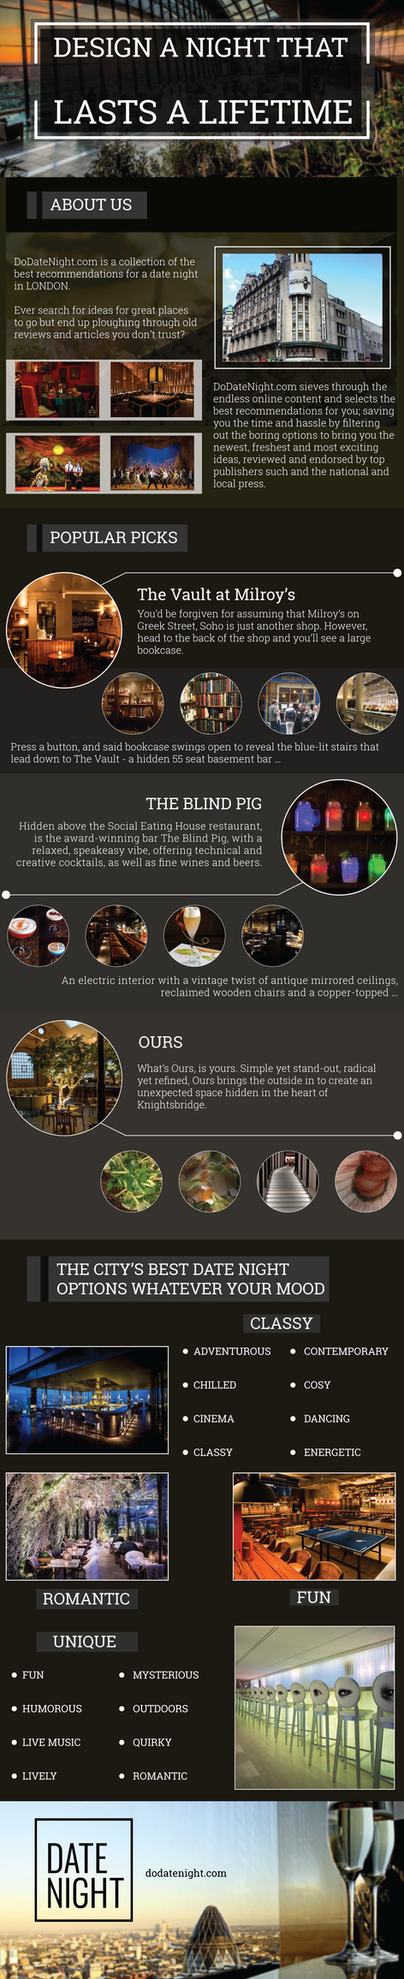 Infographic by DoDateNight